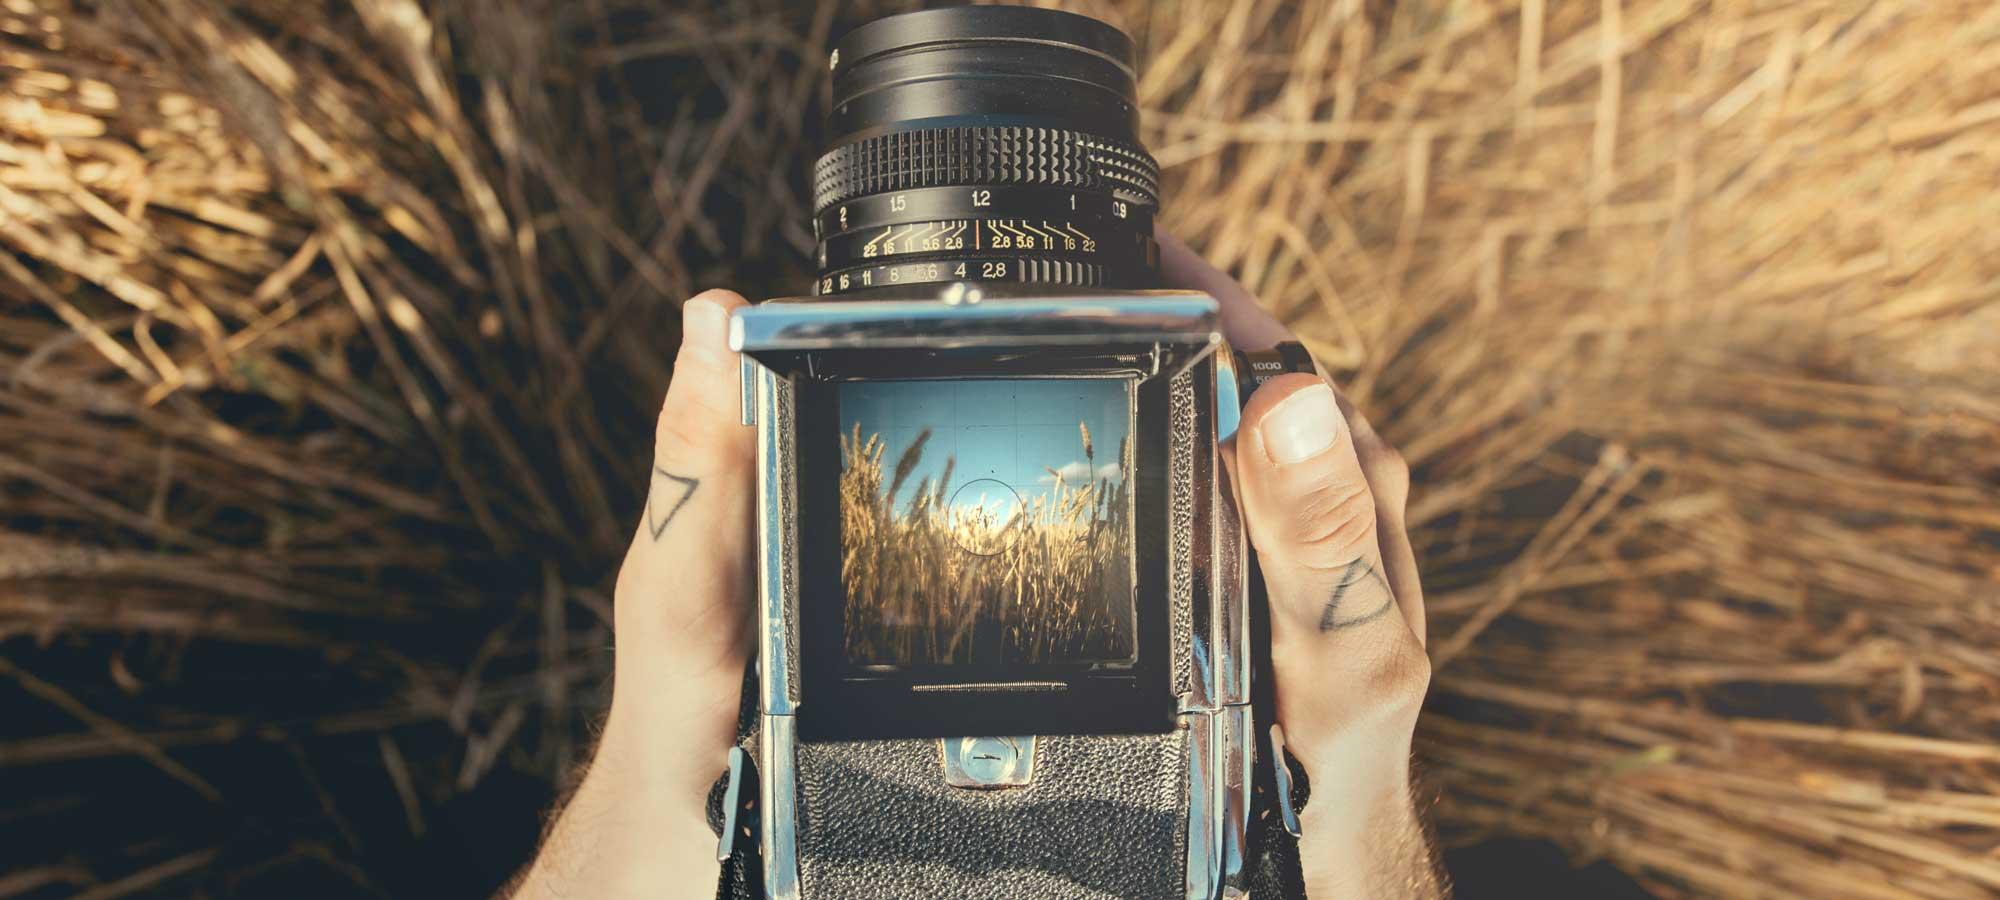 FAQ: What is a Medium Format Camera?